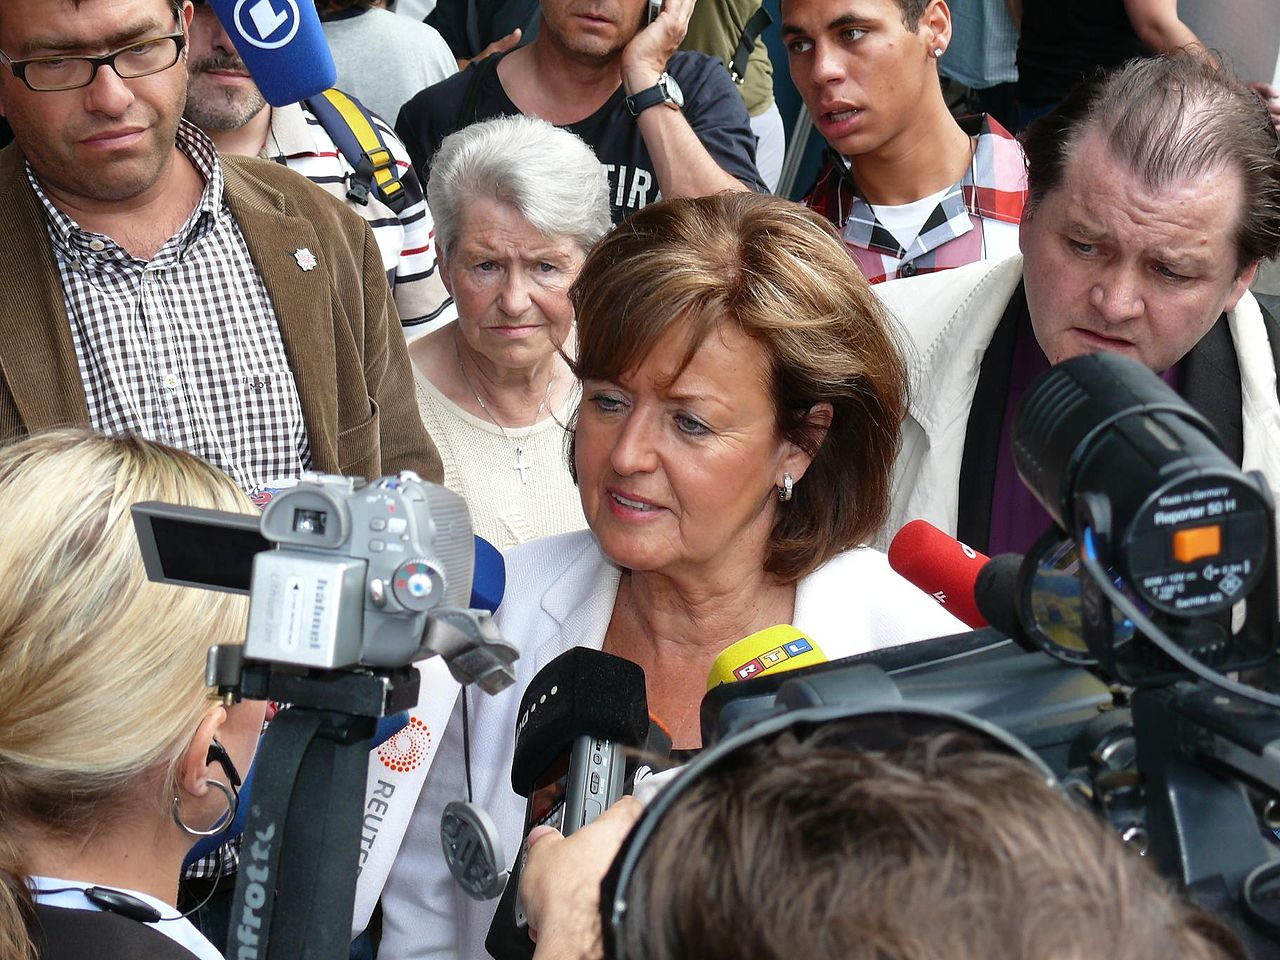 Kachelmann-Urteil-Gisela Friedrichsen1.jpg